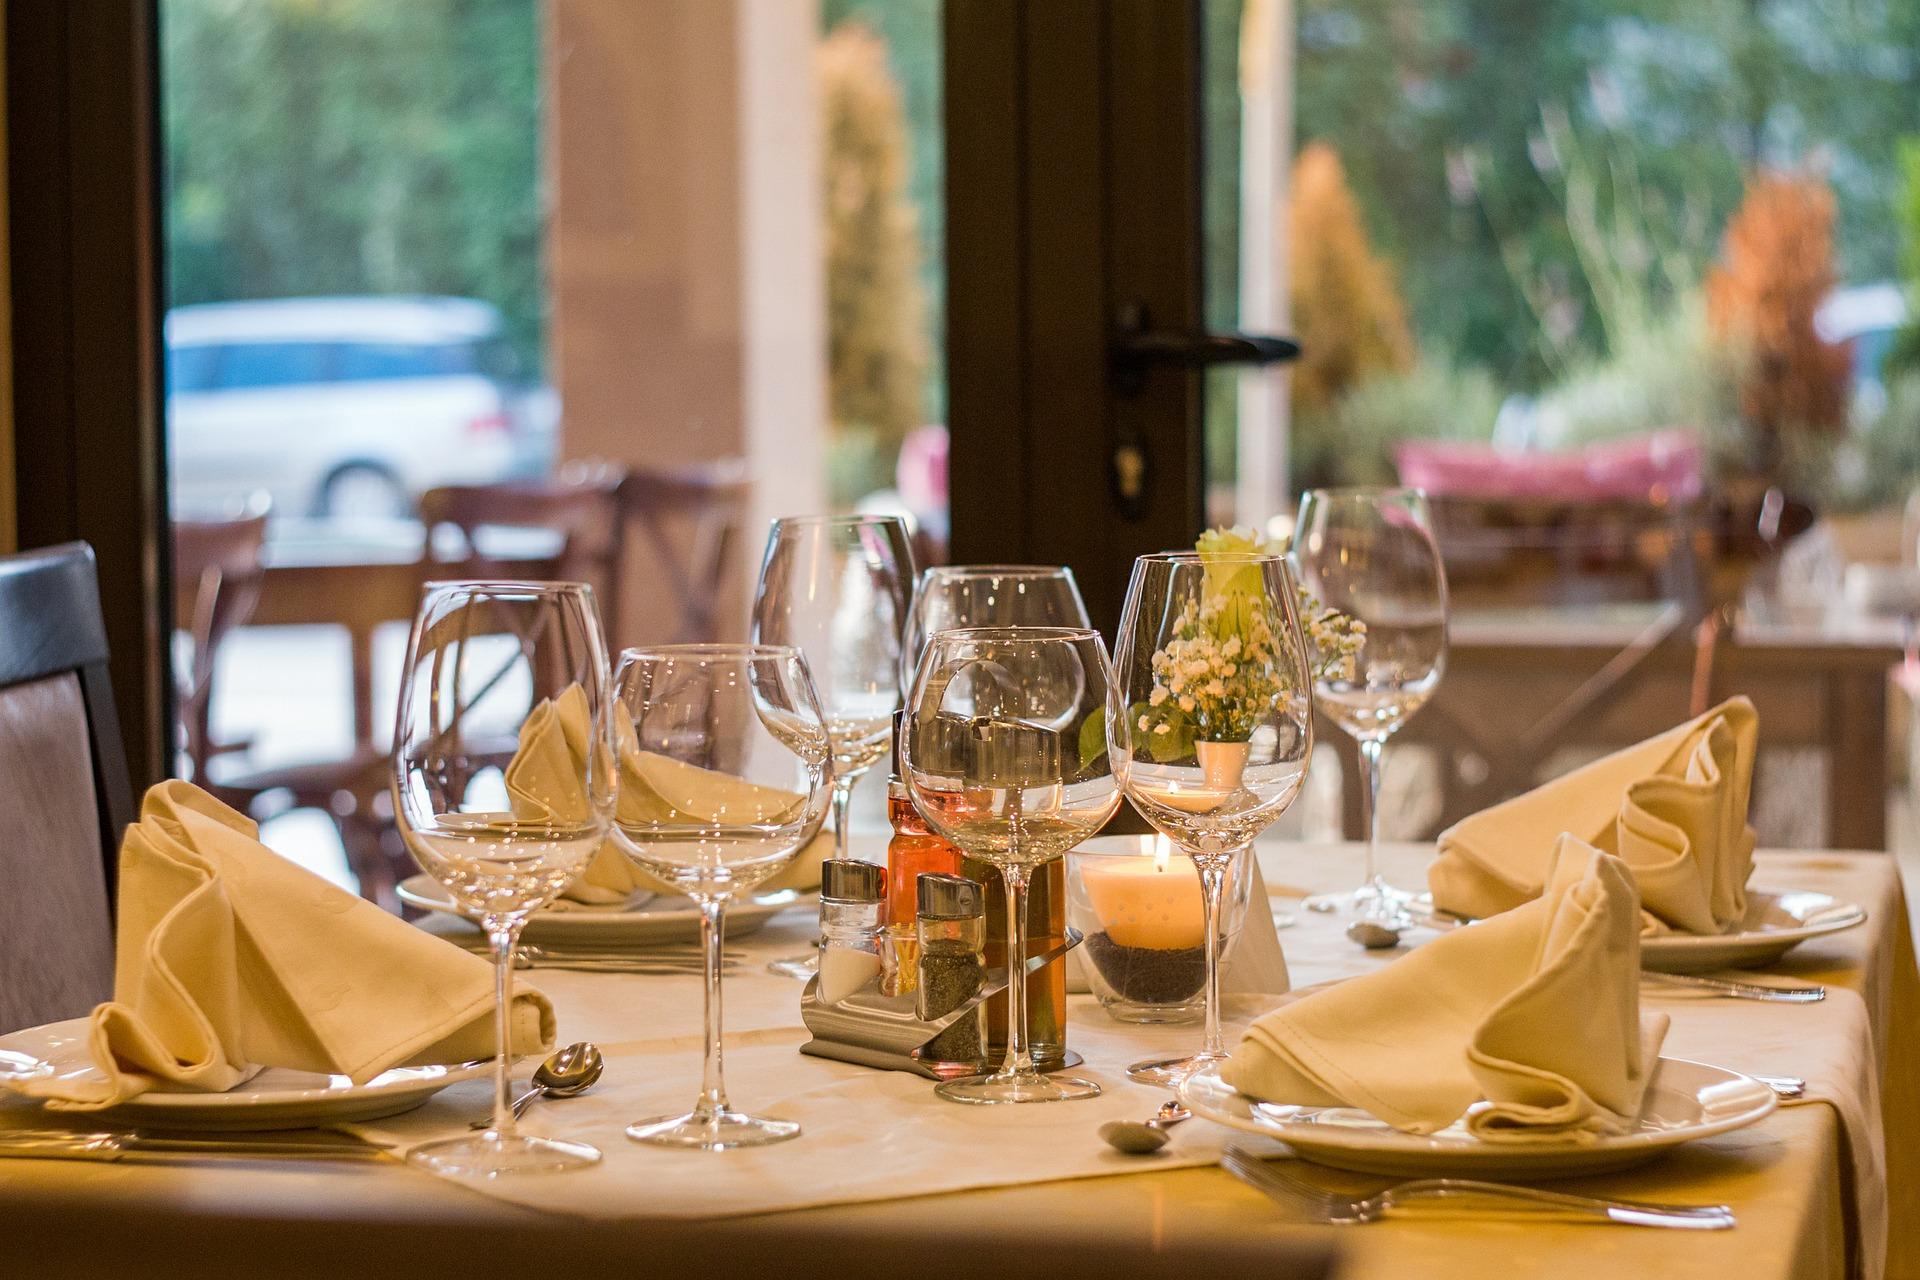 Restaurants/Cafes in Rustington (1)